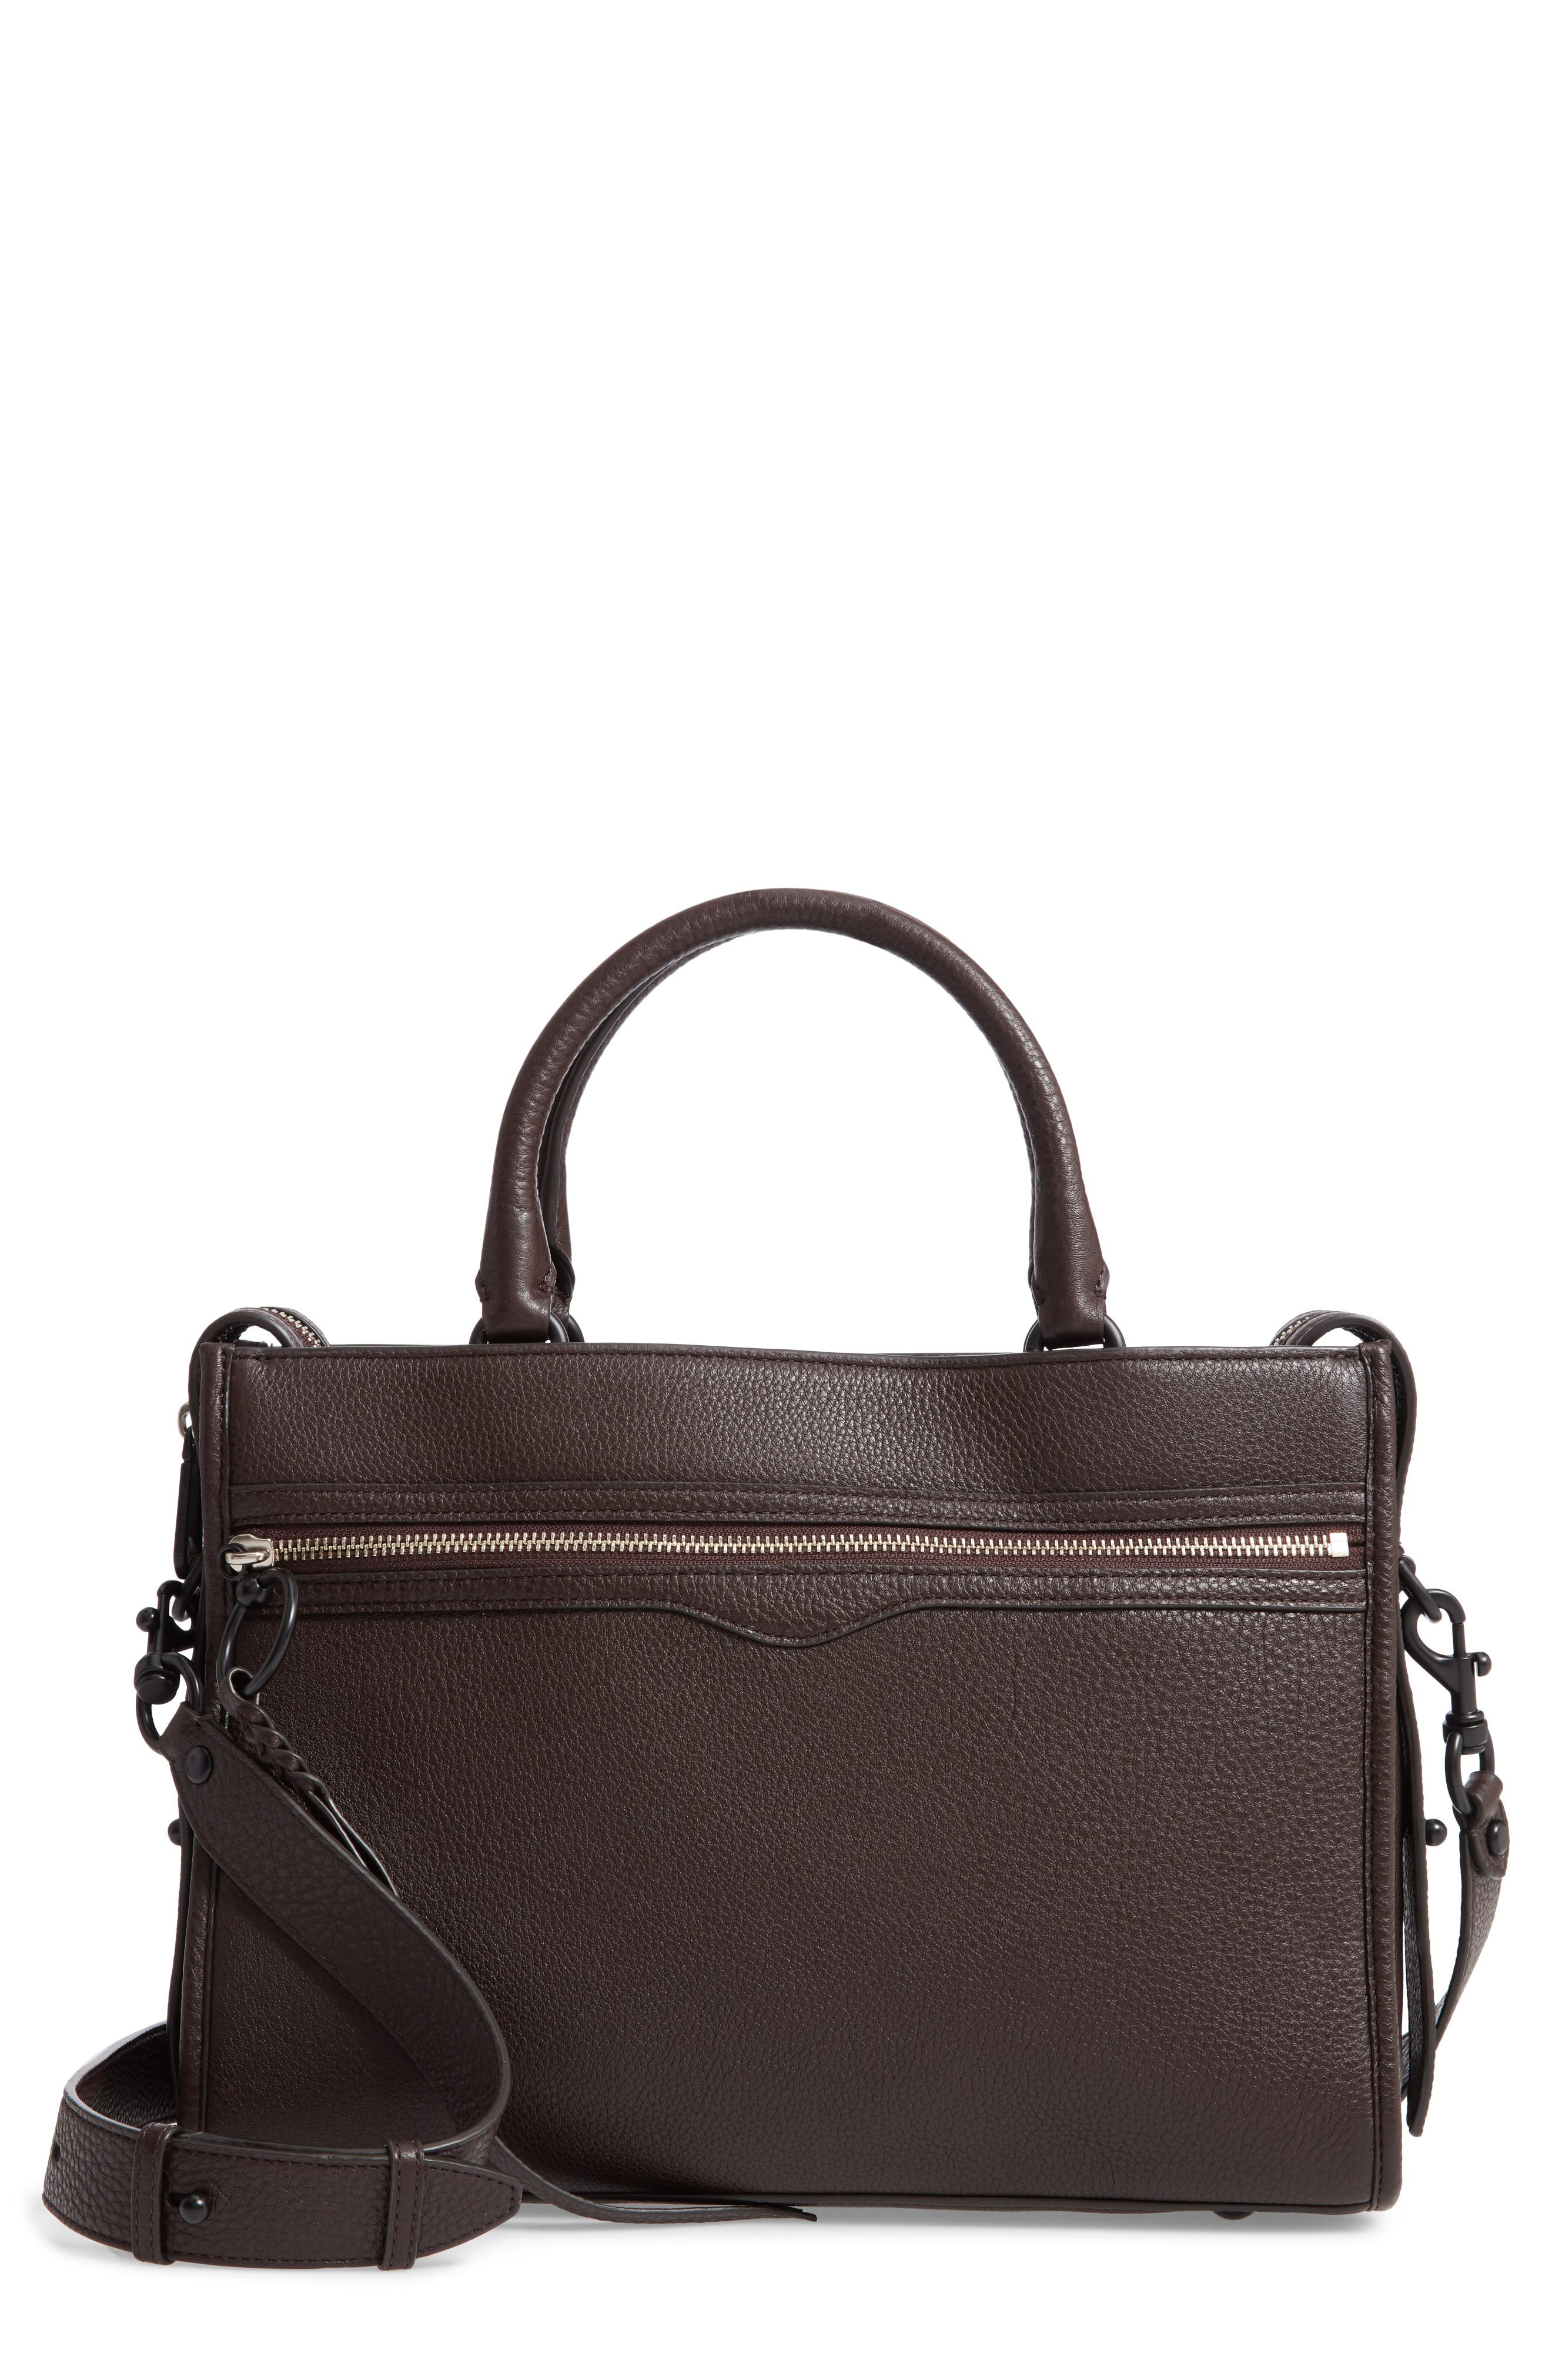 Bedford Zip Leather Satchel,                         Main,                         color, GANACHE